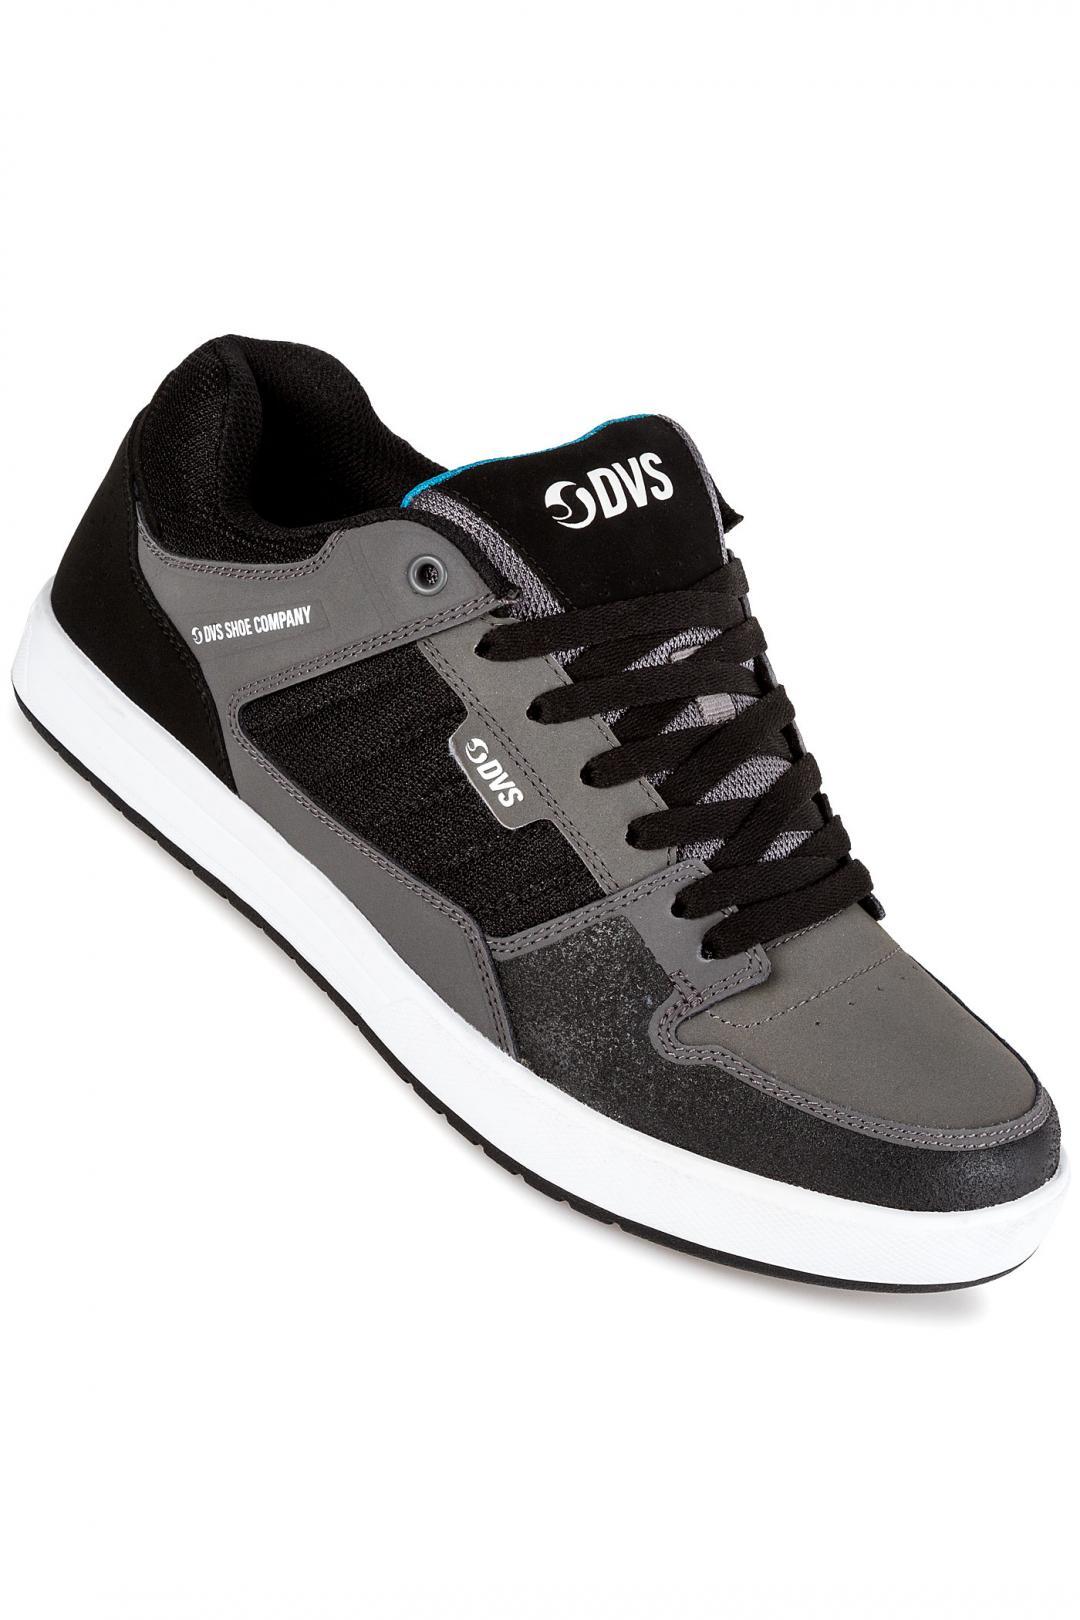 Uomo DVS Portal charcoal black | Sneakers low top